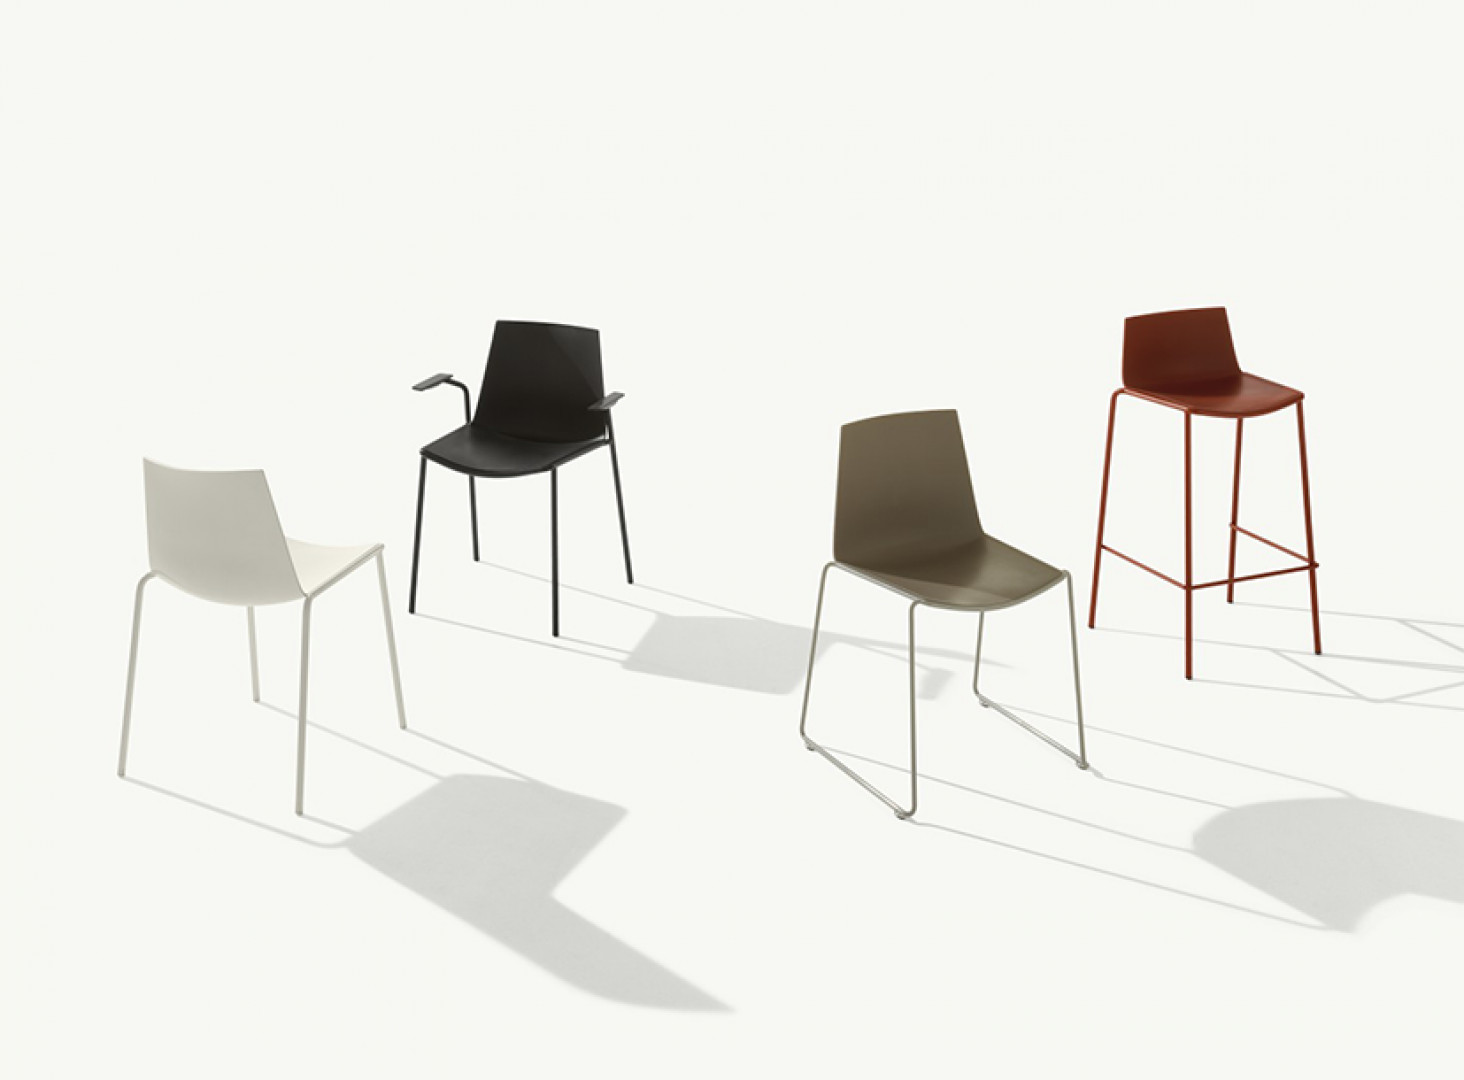 Krzesła z kolekcji Cuba firmy Metalmobil. Projekt: Marc Sadler. Fot. Metalmobil